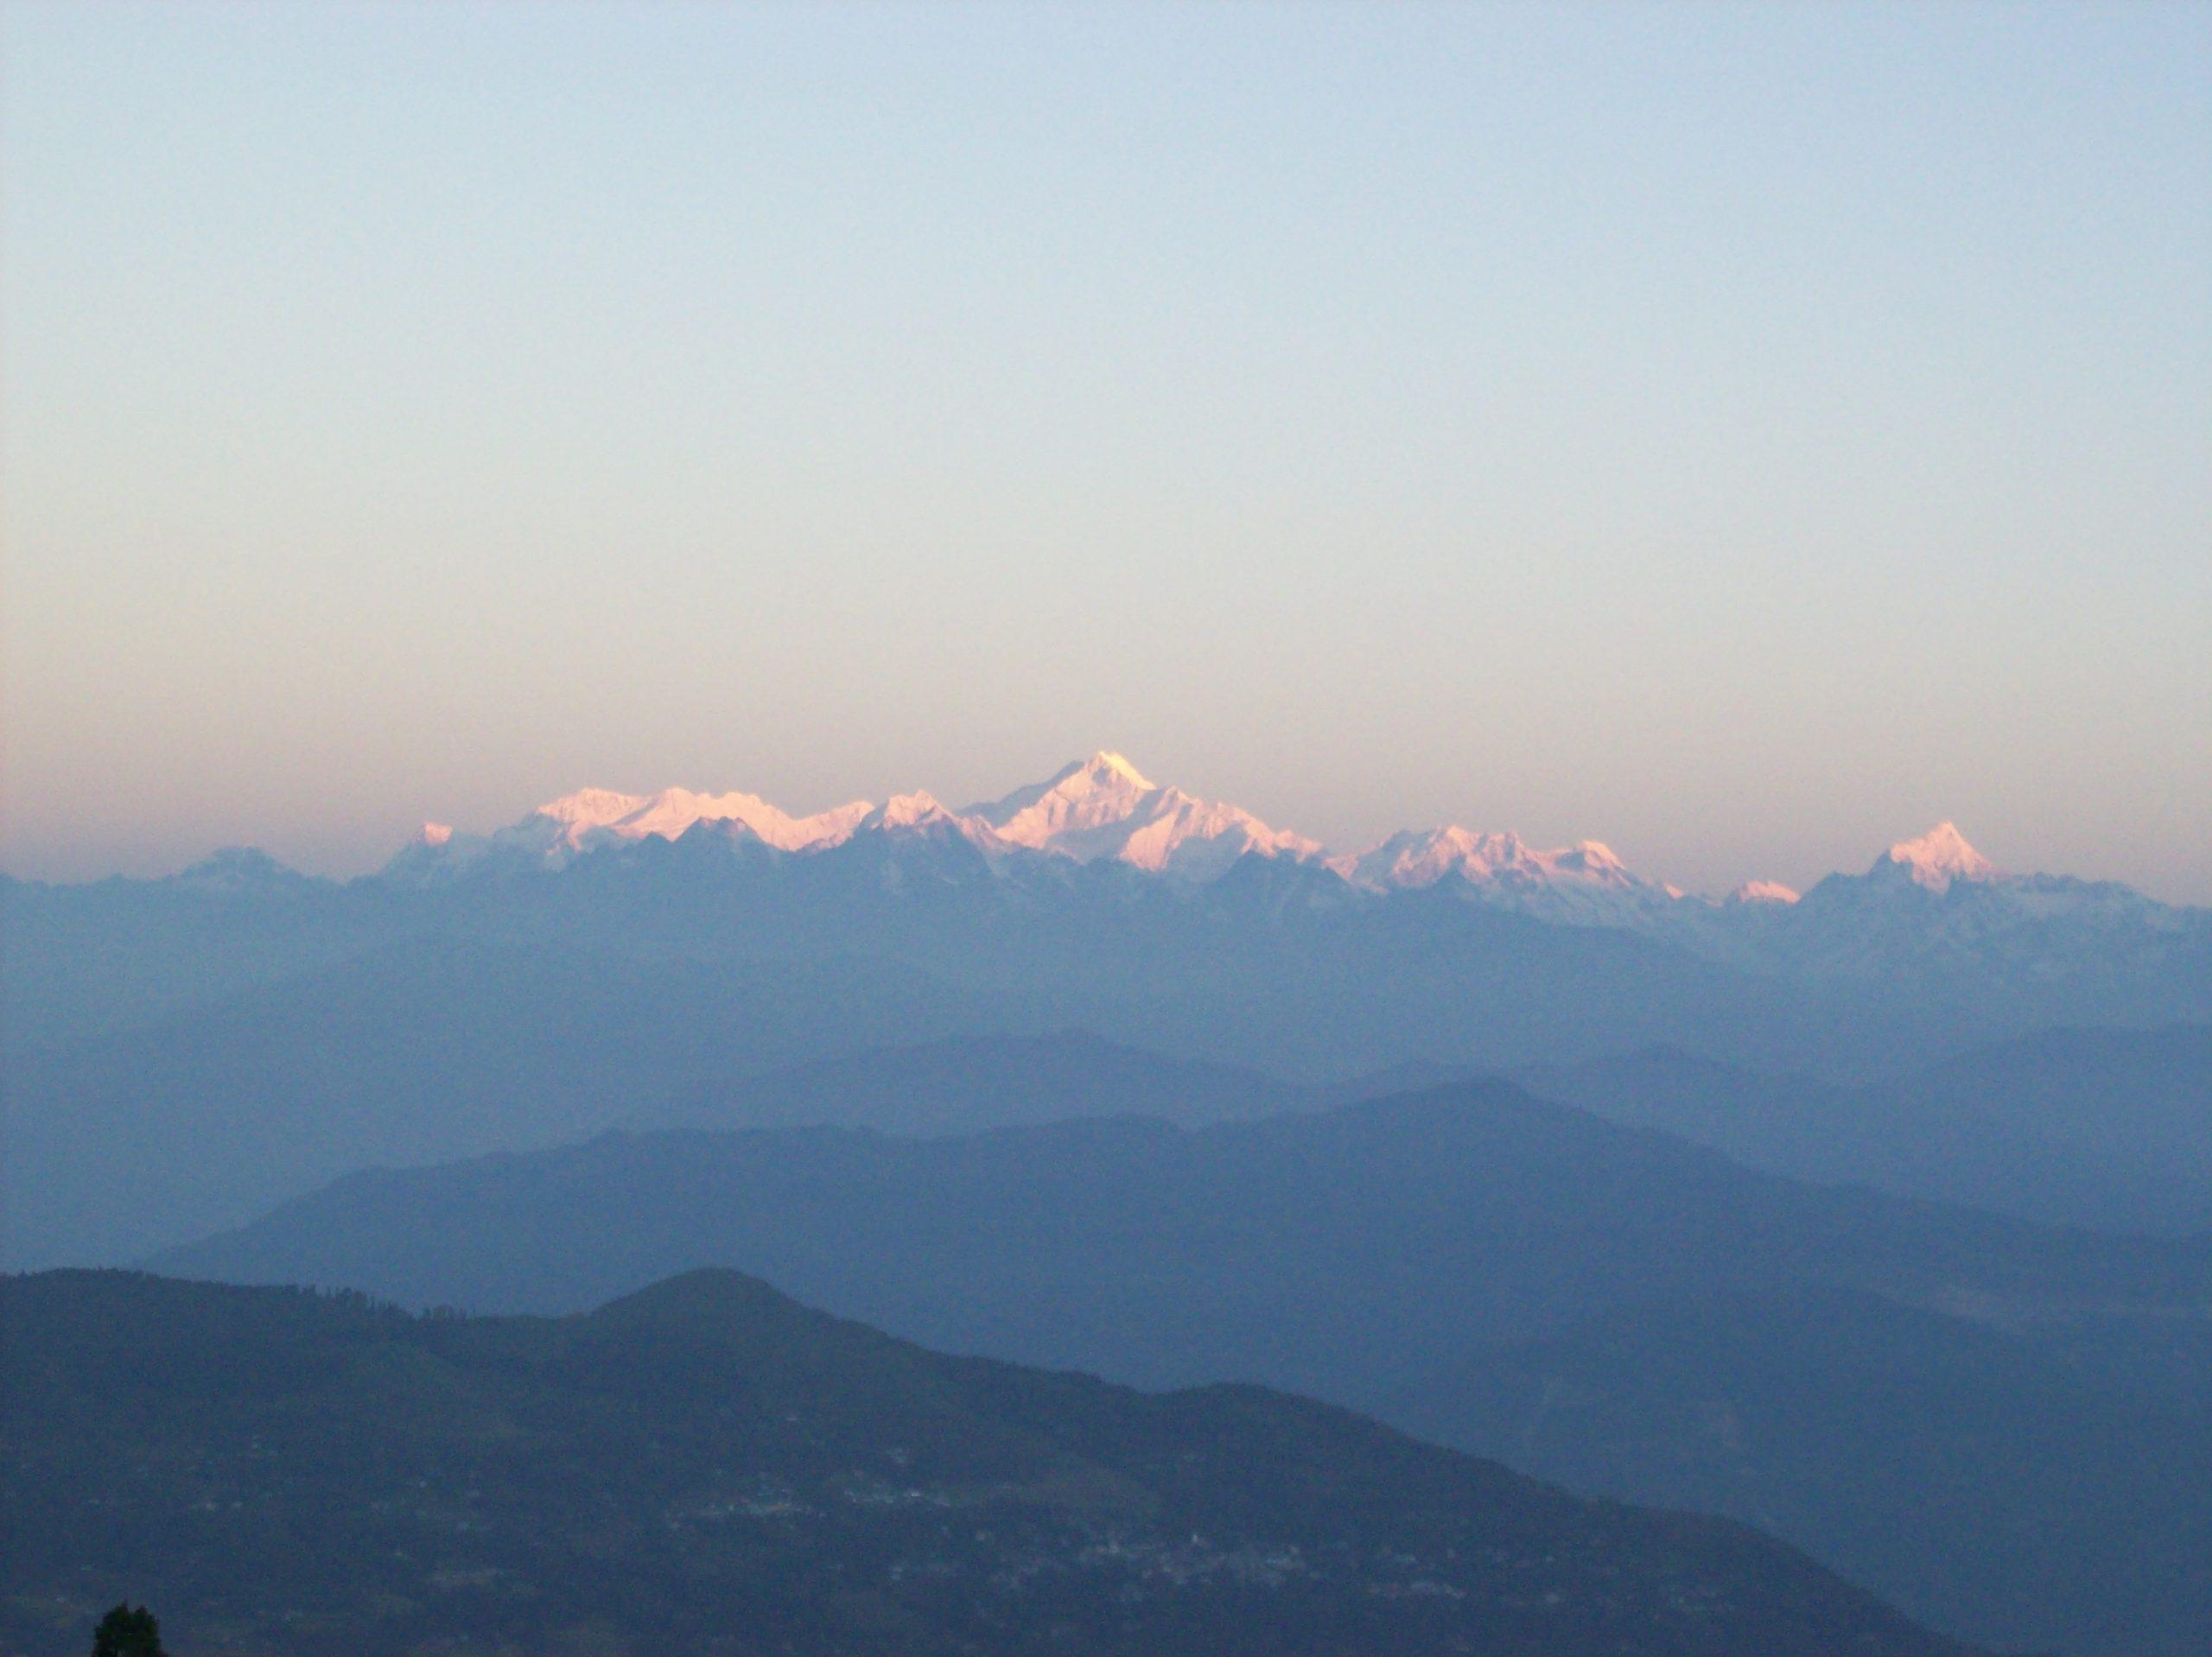 Kanchenjungha mountains